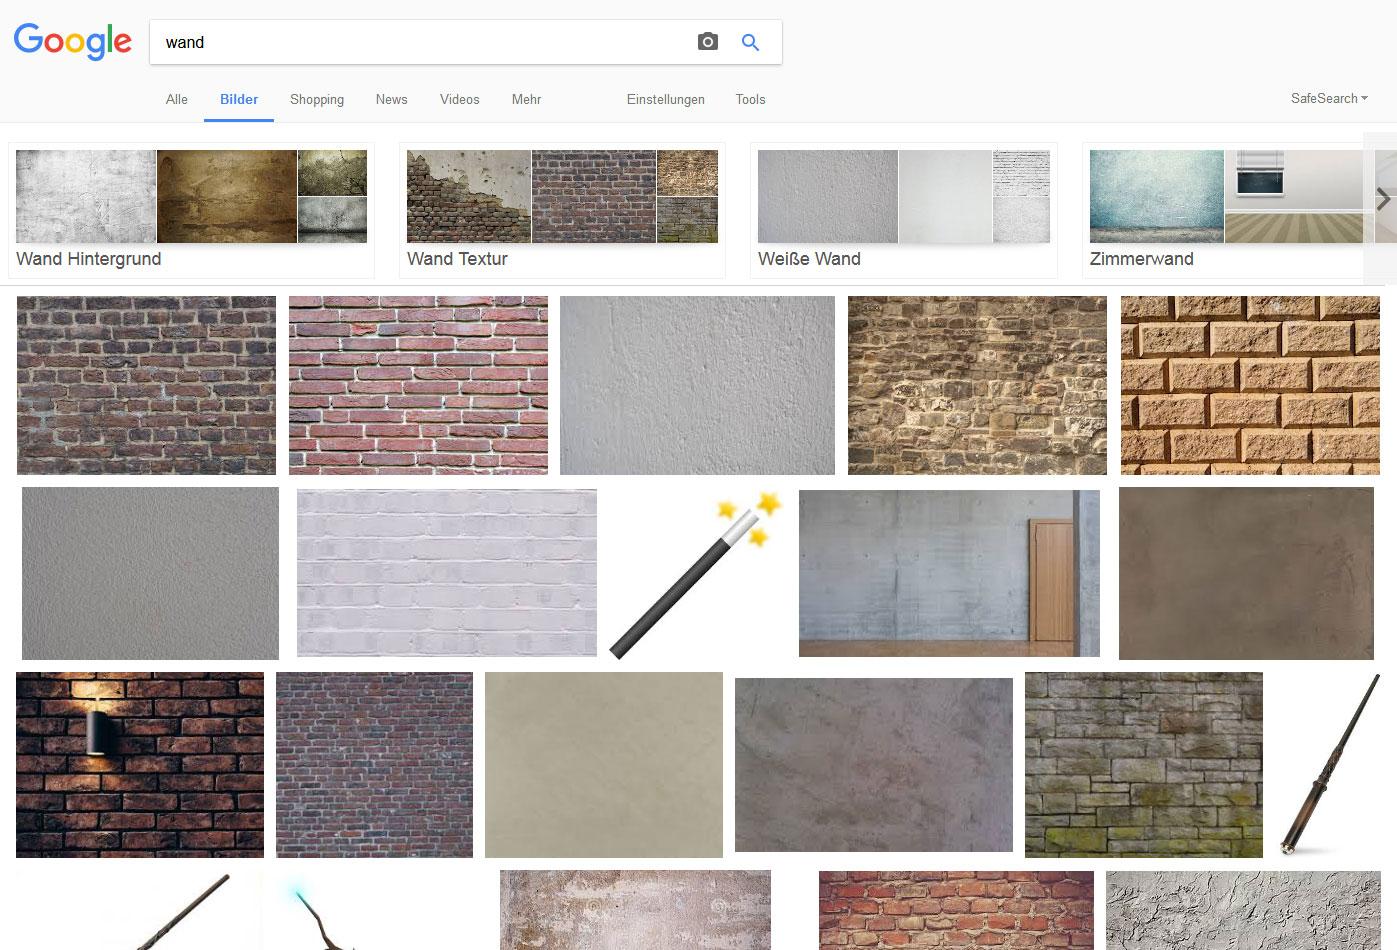 Google-Bildersuche: Wand